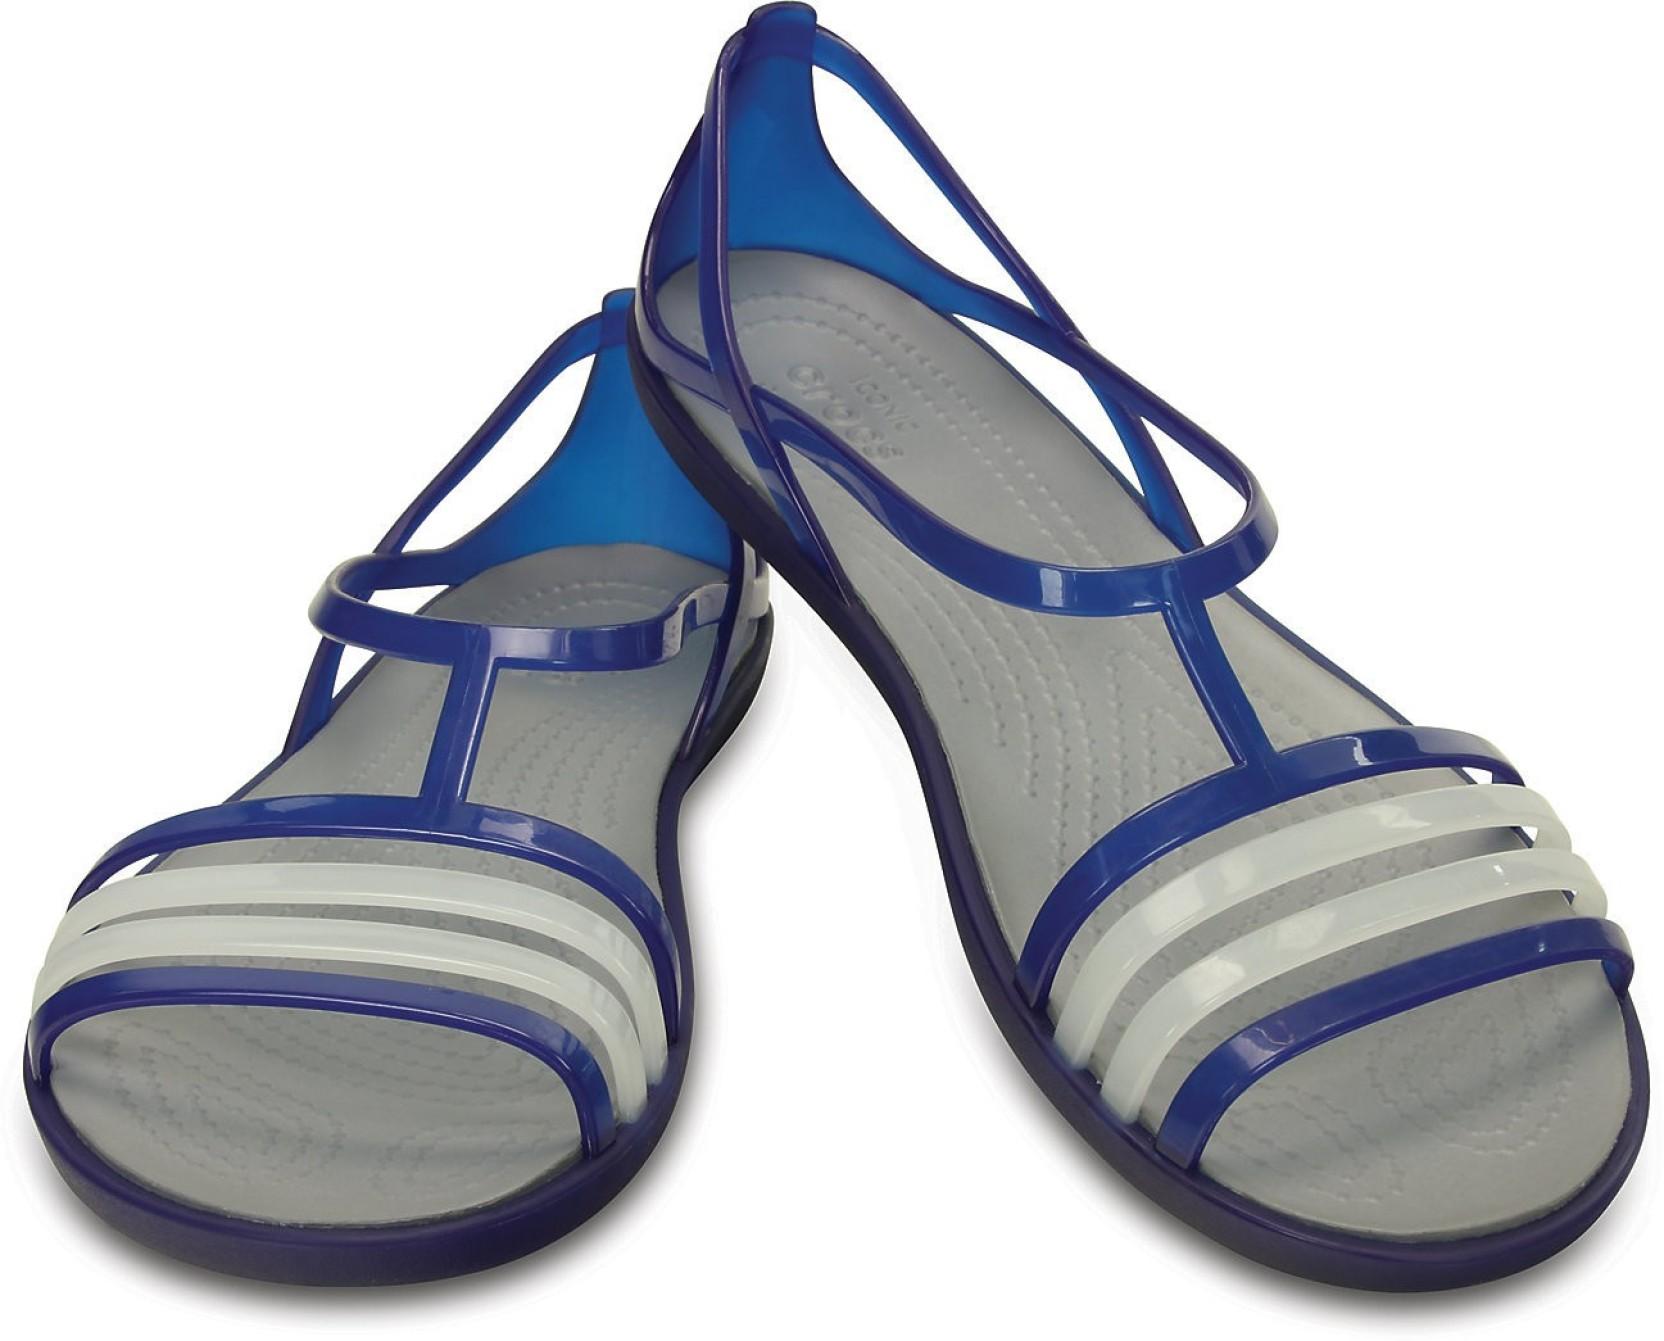 ce38e57b6 Crocs Women Cerulean Blue Bellies - Buy Crocs Women Cerulean Blue ...